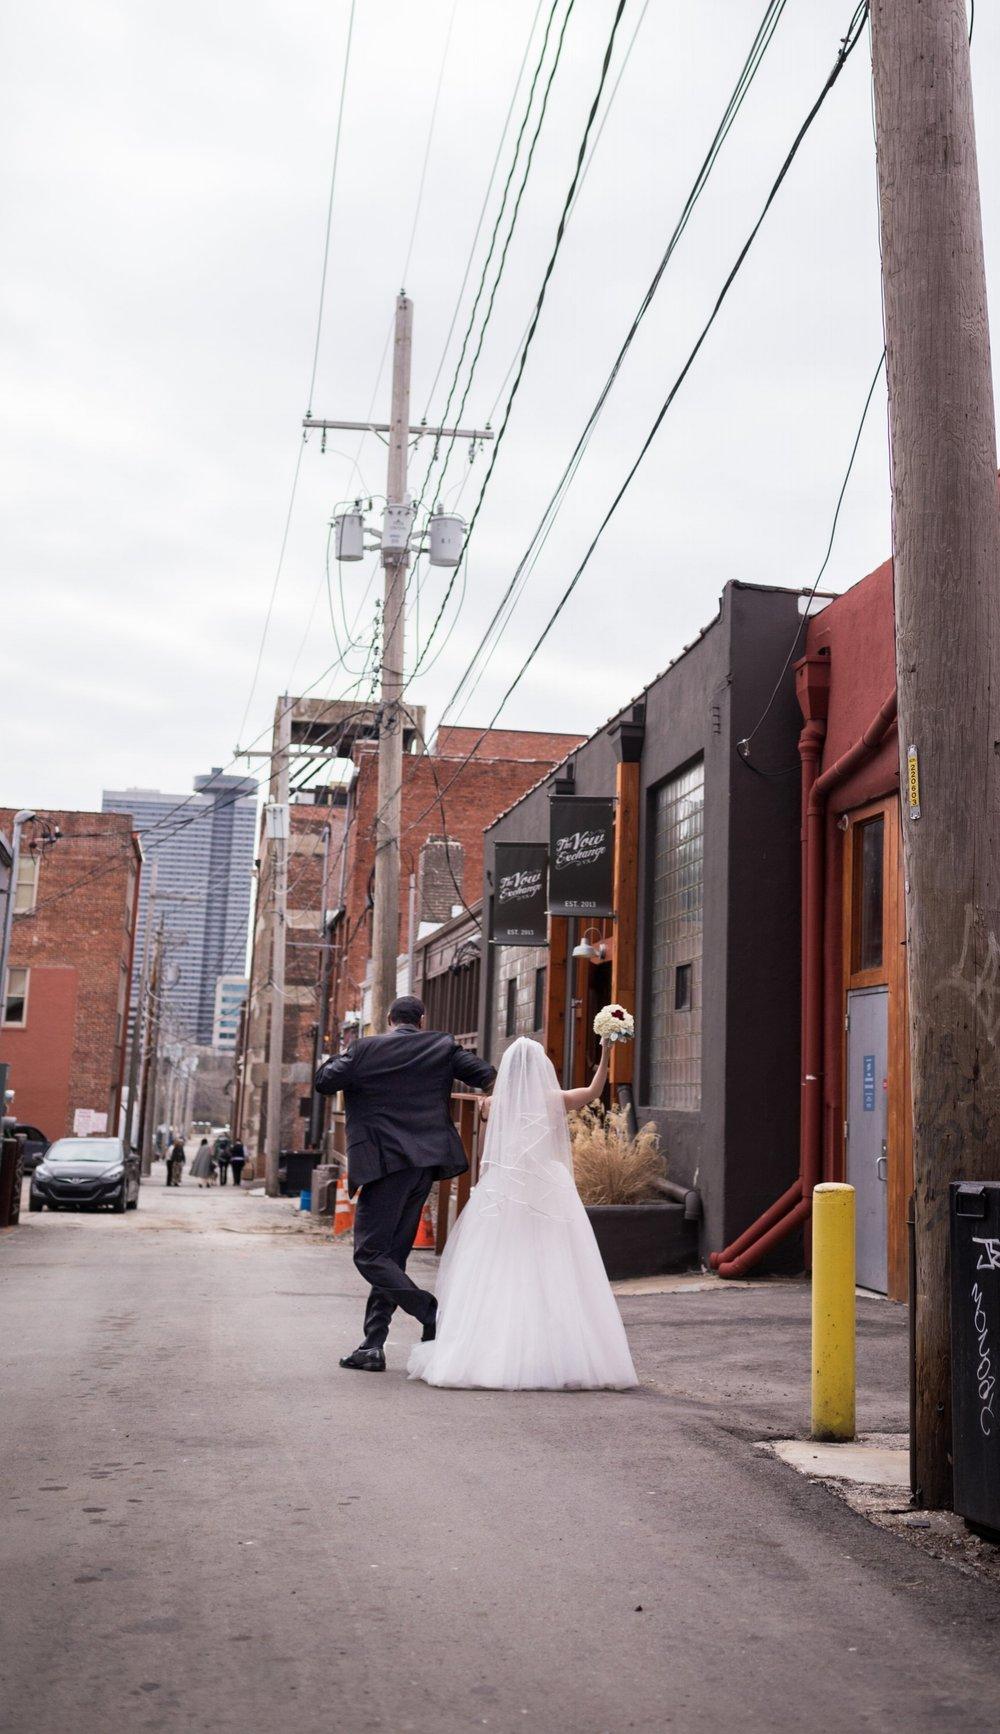 Kansas_City_Small_Wedding_Venue_Elope_Intimate_Ceremony_Budget_Affordable_15MinWedding-180.jpg